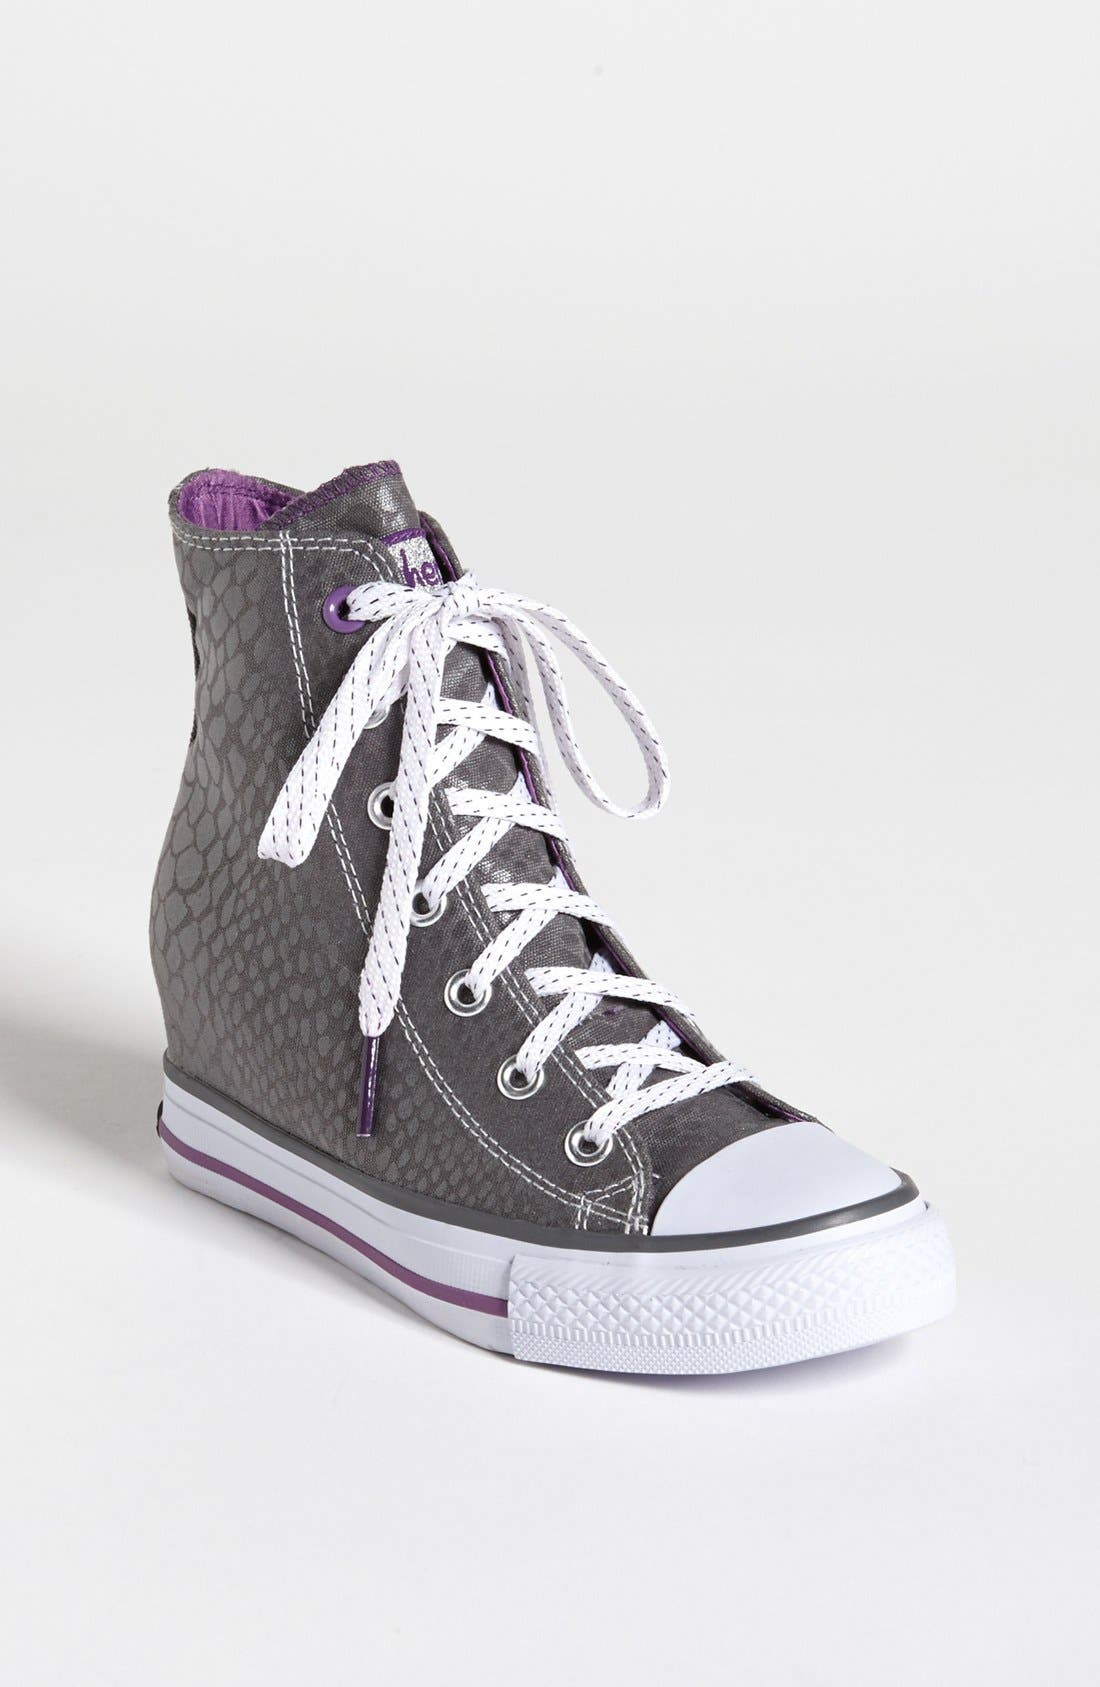 Main Image - SKECHERS 'Gimme Wedge' Sneaker (Toddler, Little Kid & Big Kid)